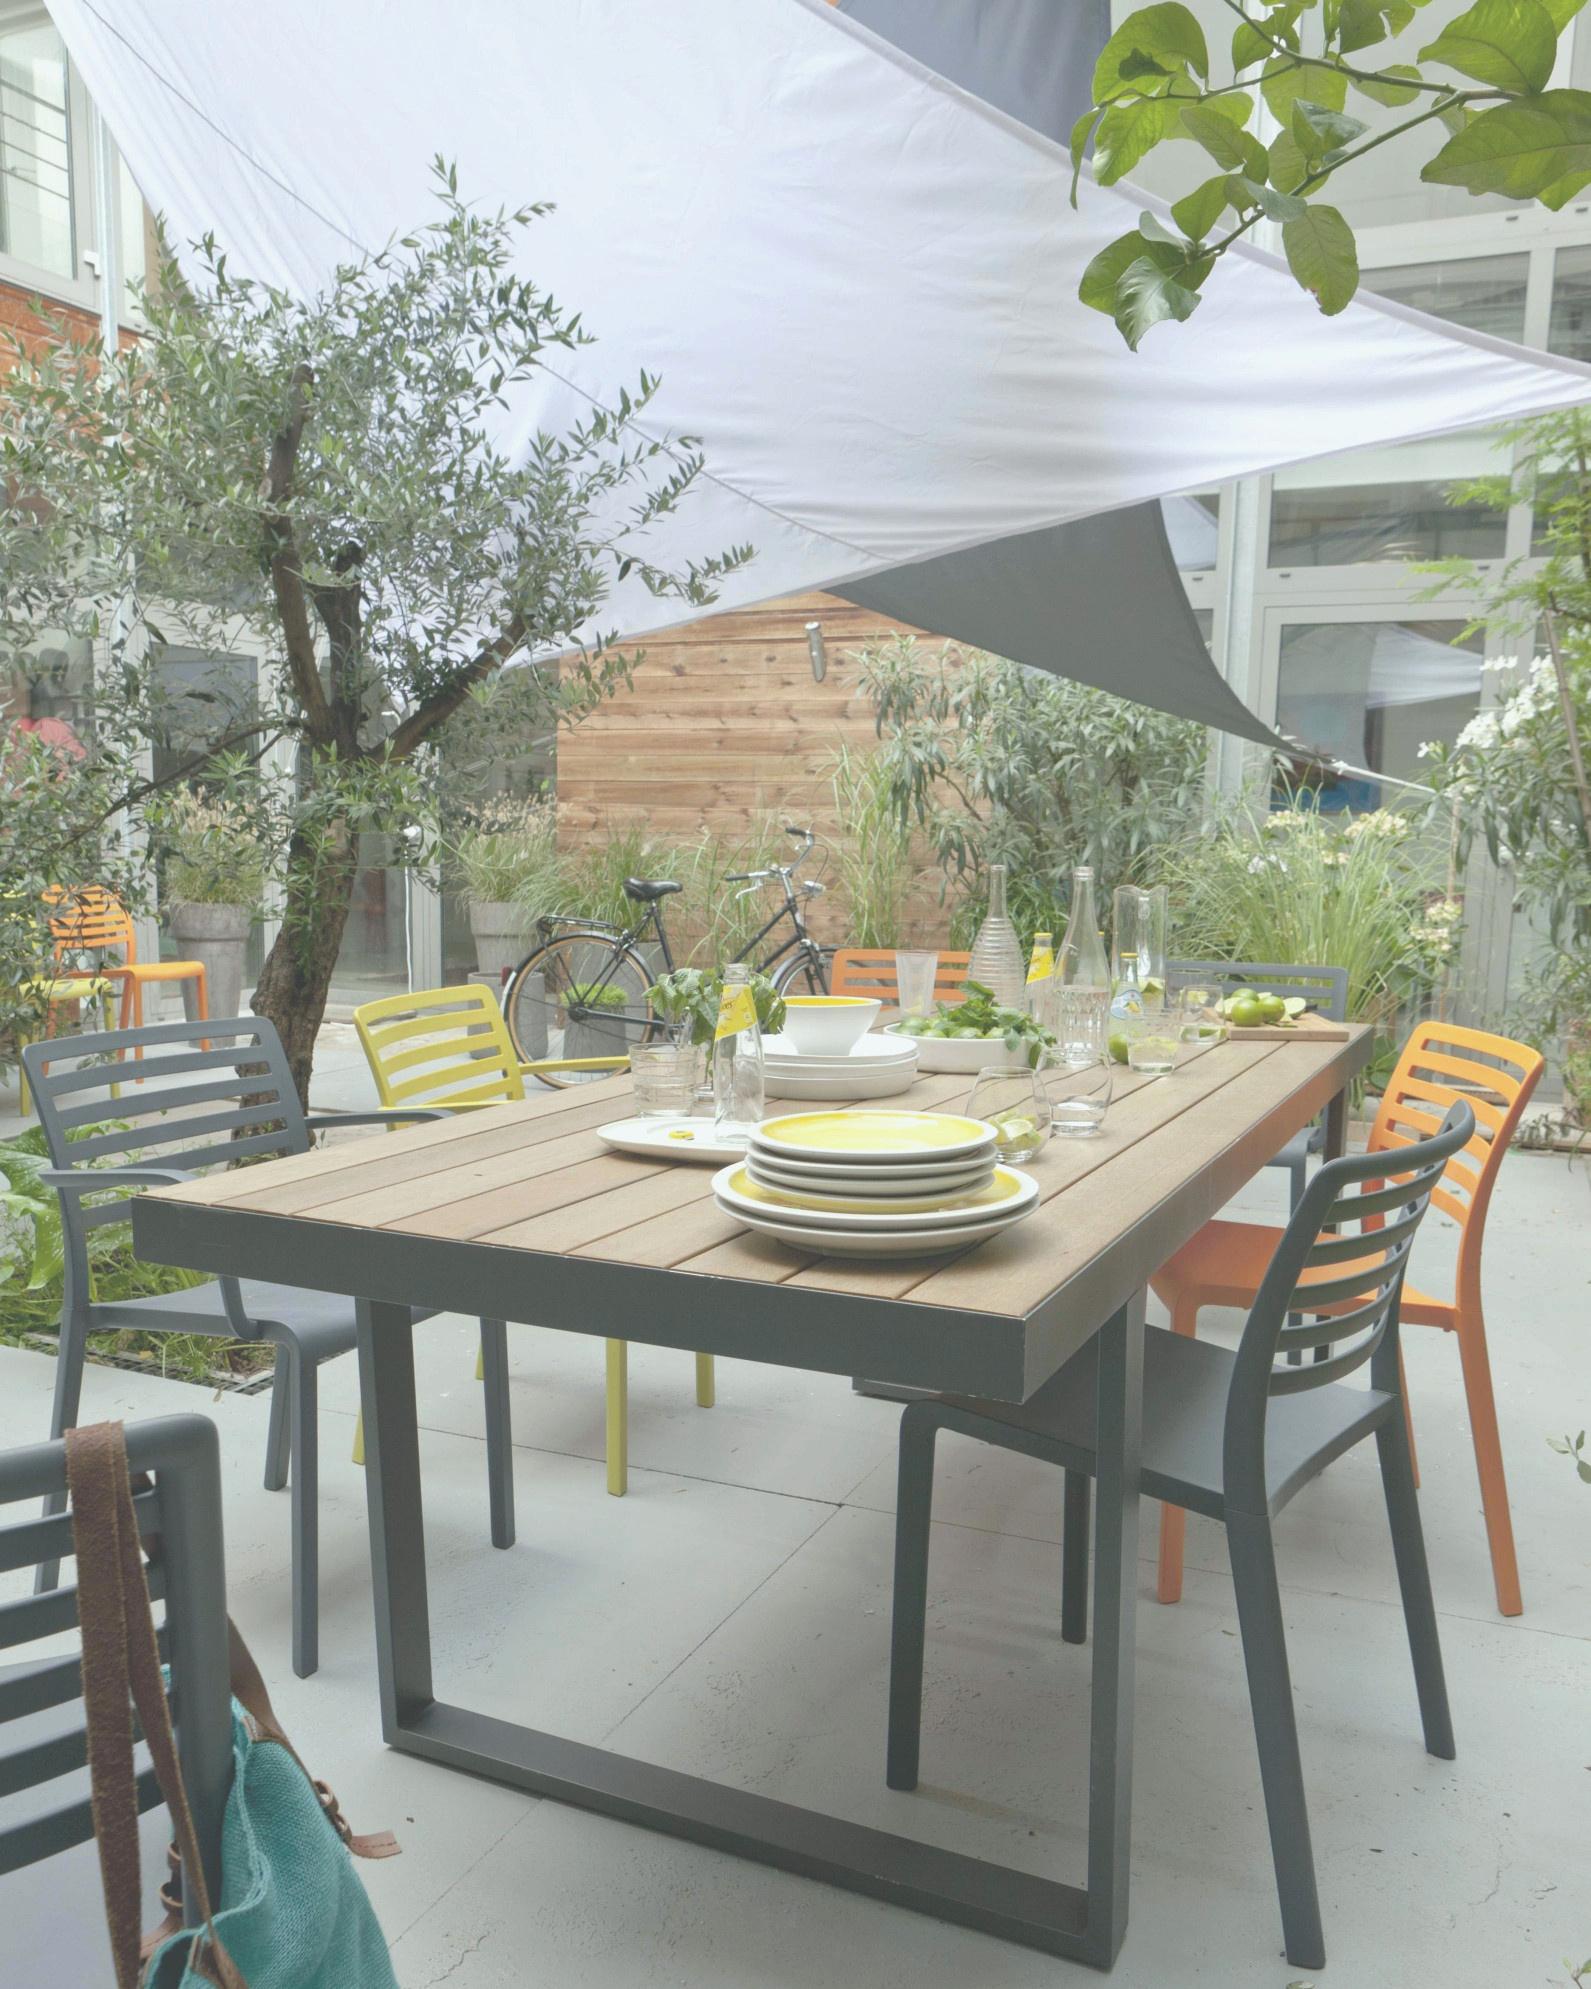 Luxe Vente Privee Chaise - Luckytroll avec Vente Privée Jardin